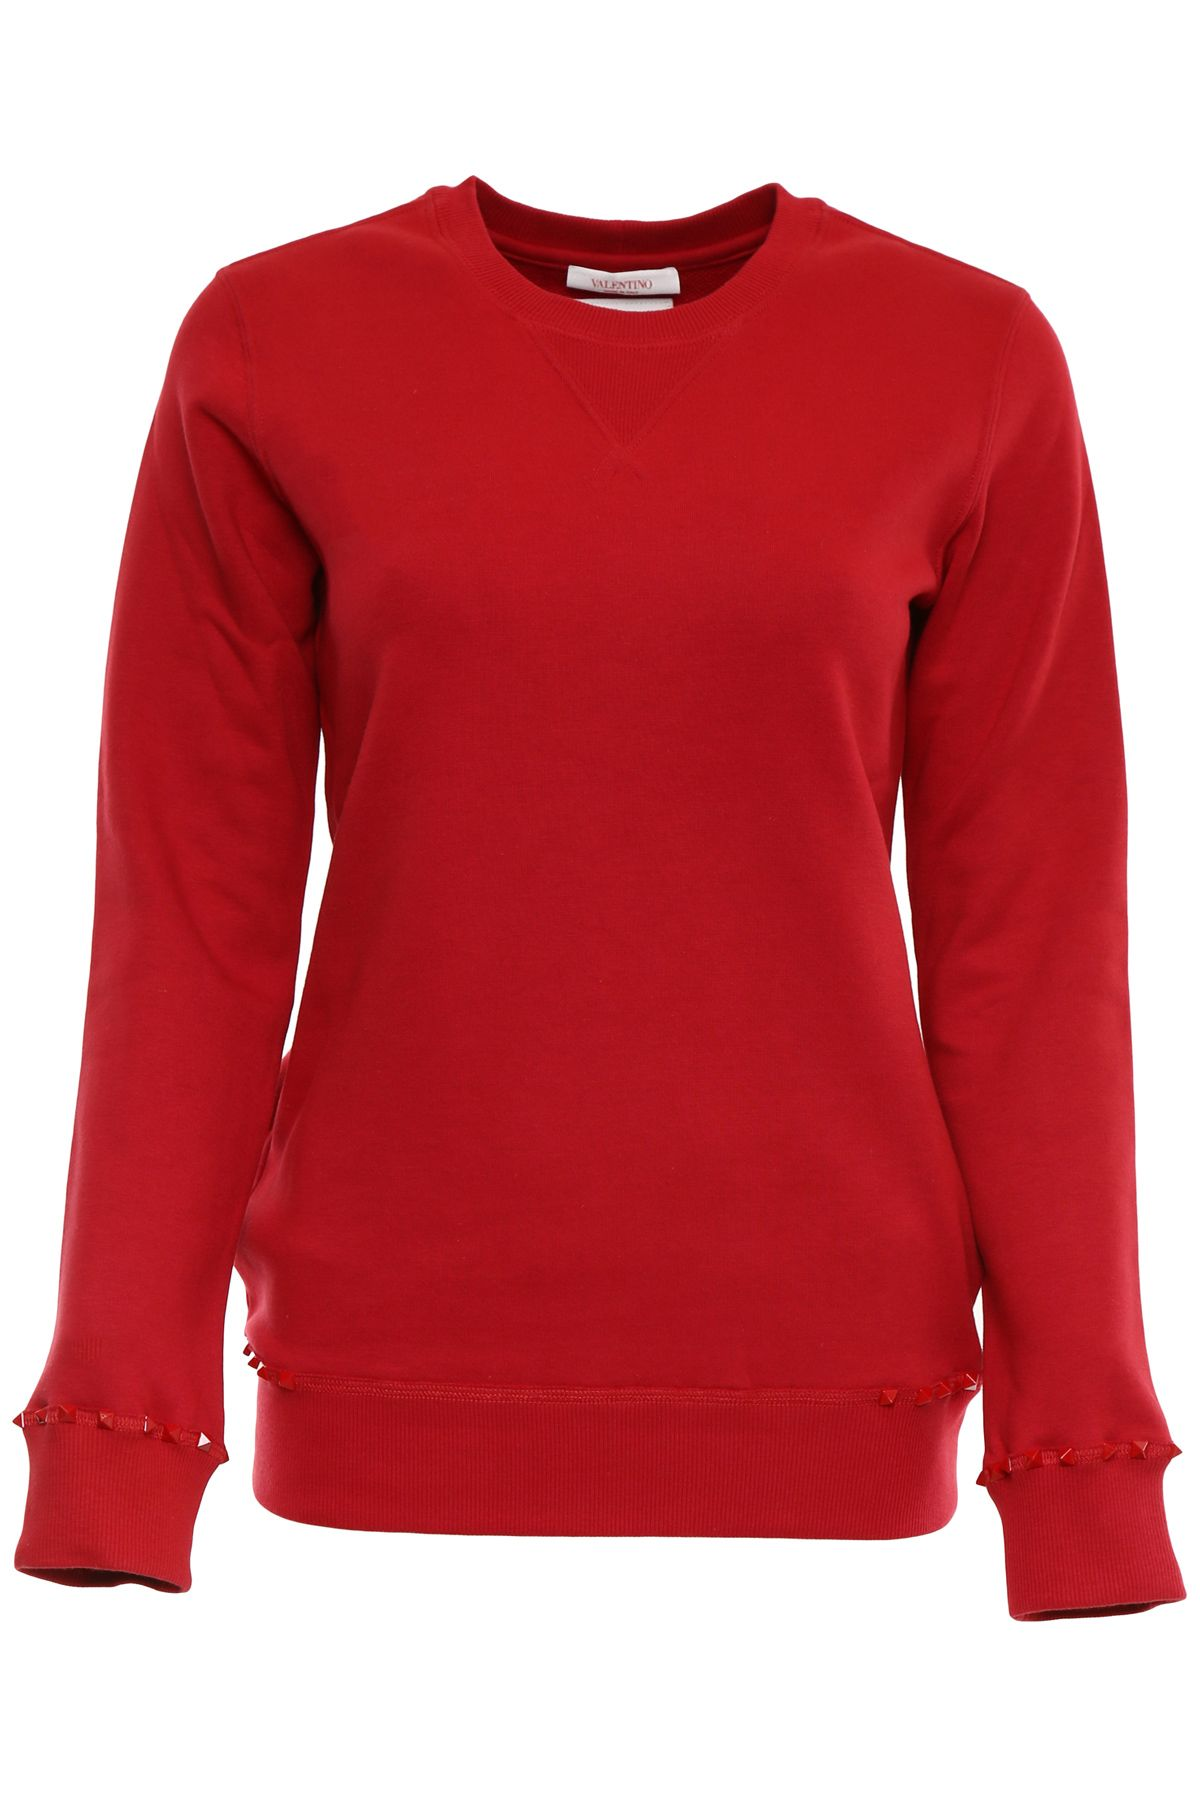 Valentino Rockstud Untitled Jersey Sweatshirt